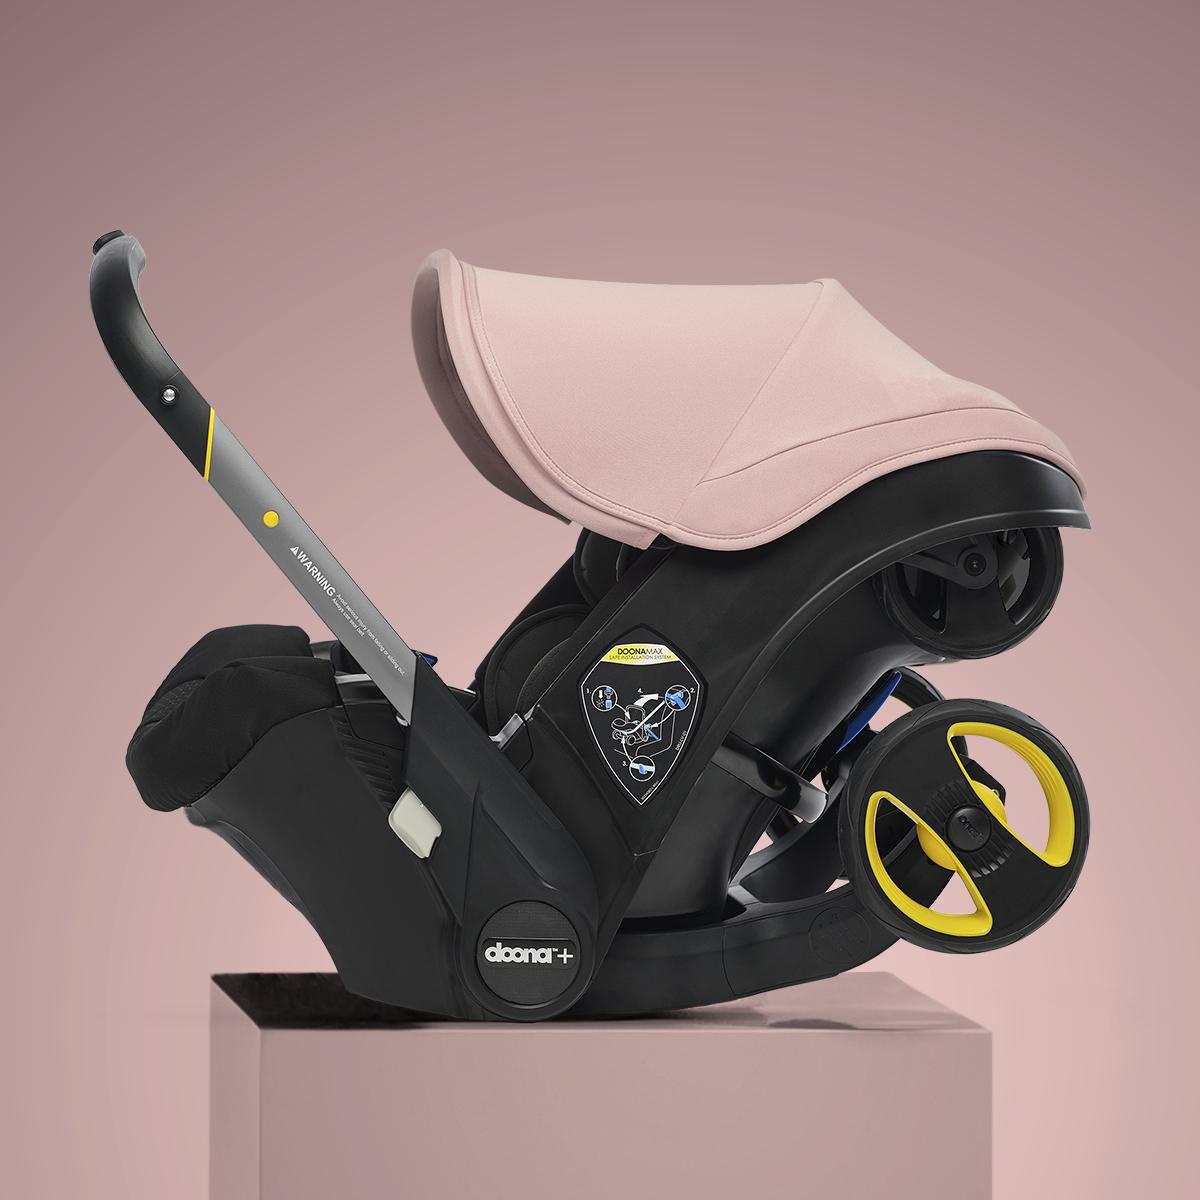 SiègeAuto Doona+ Collection 2019 Stroller, Doona car